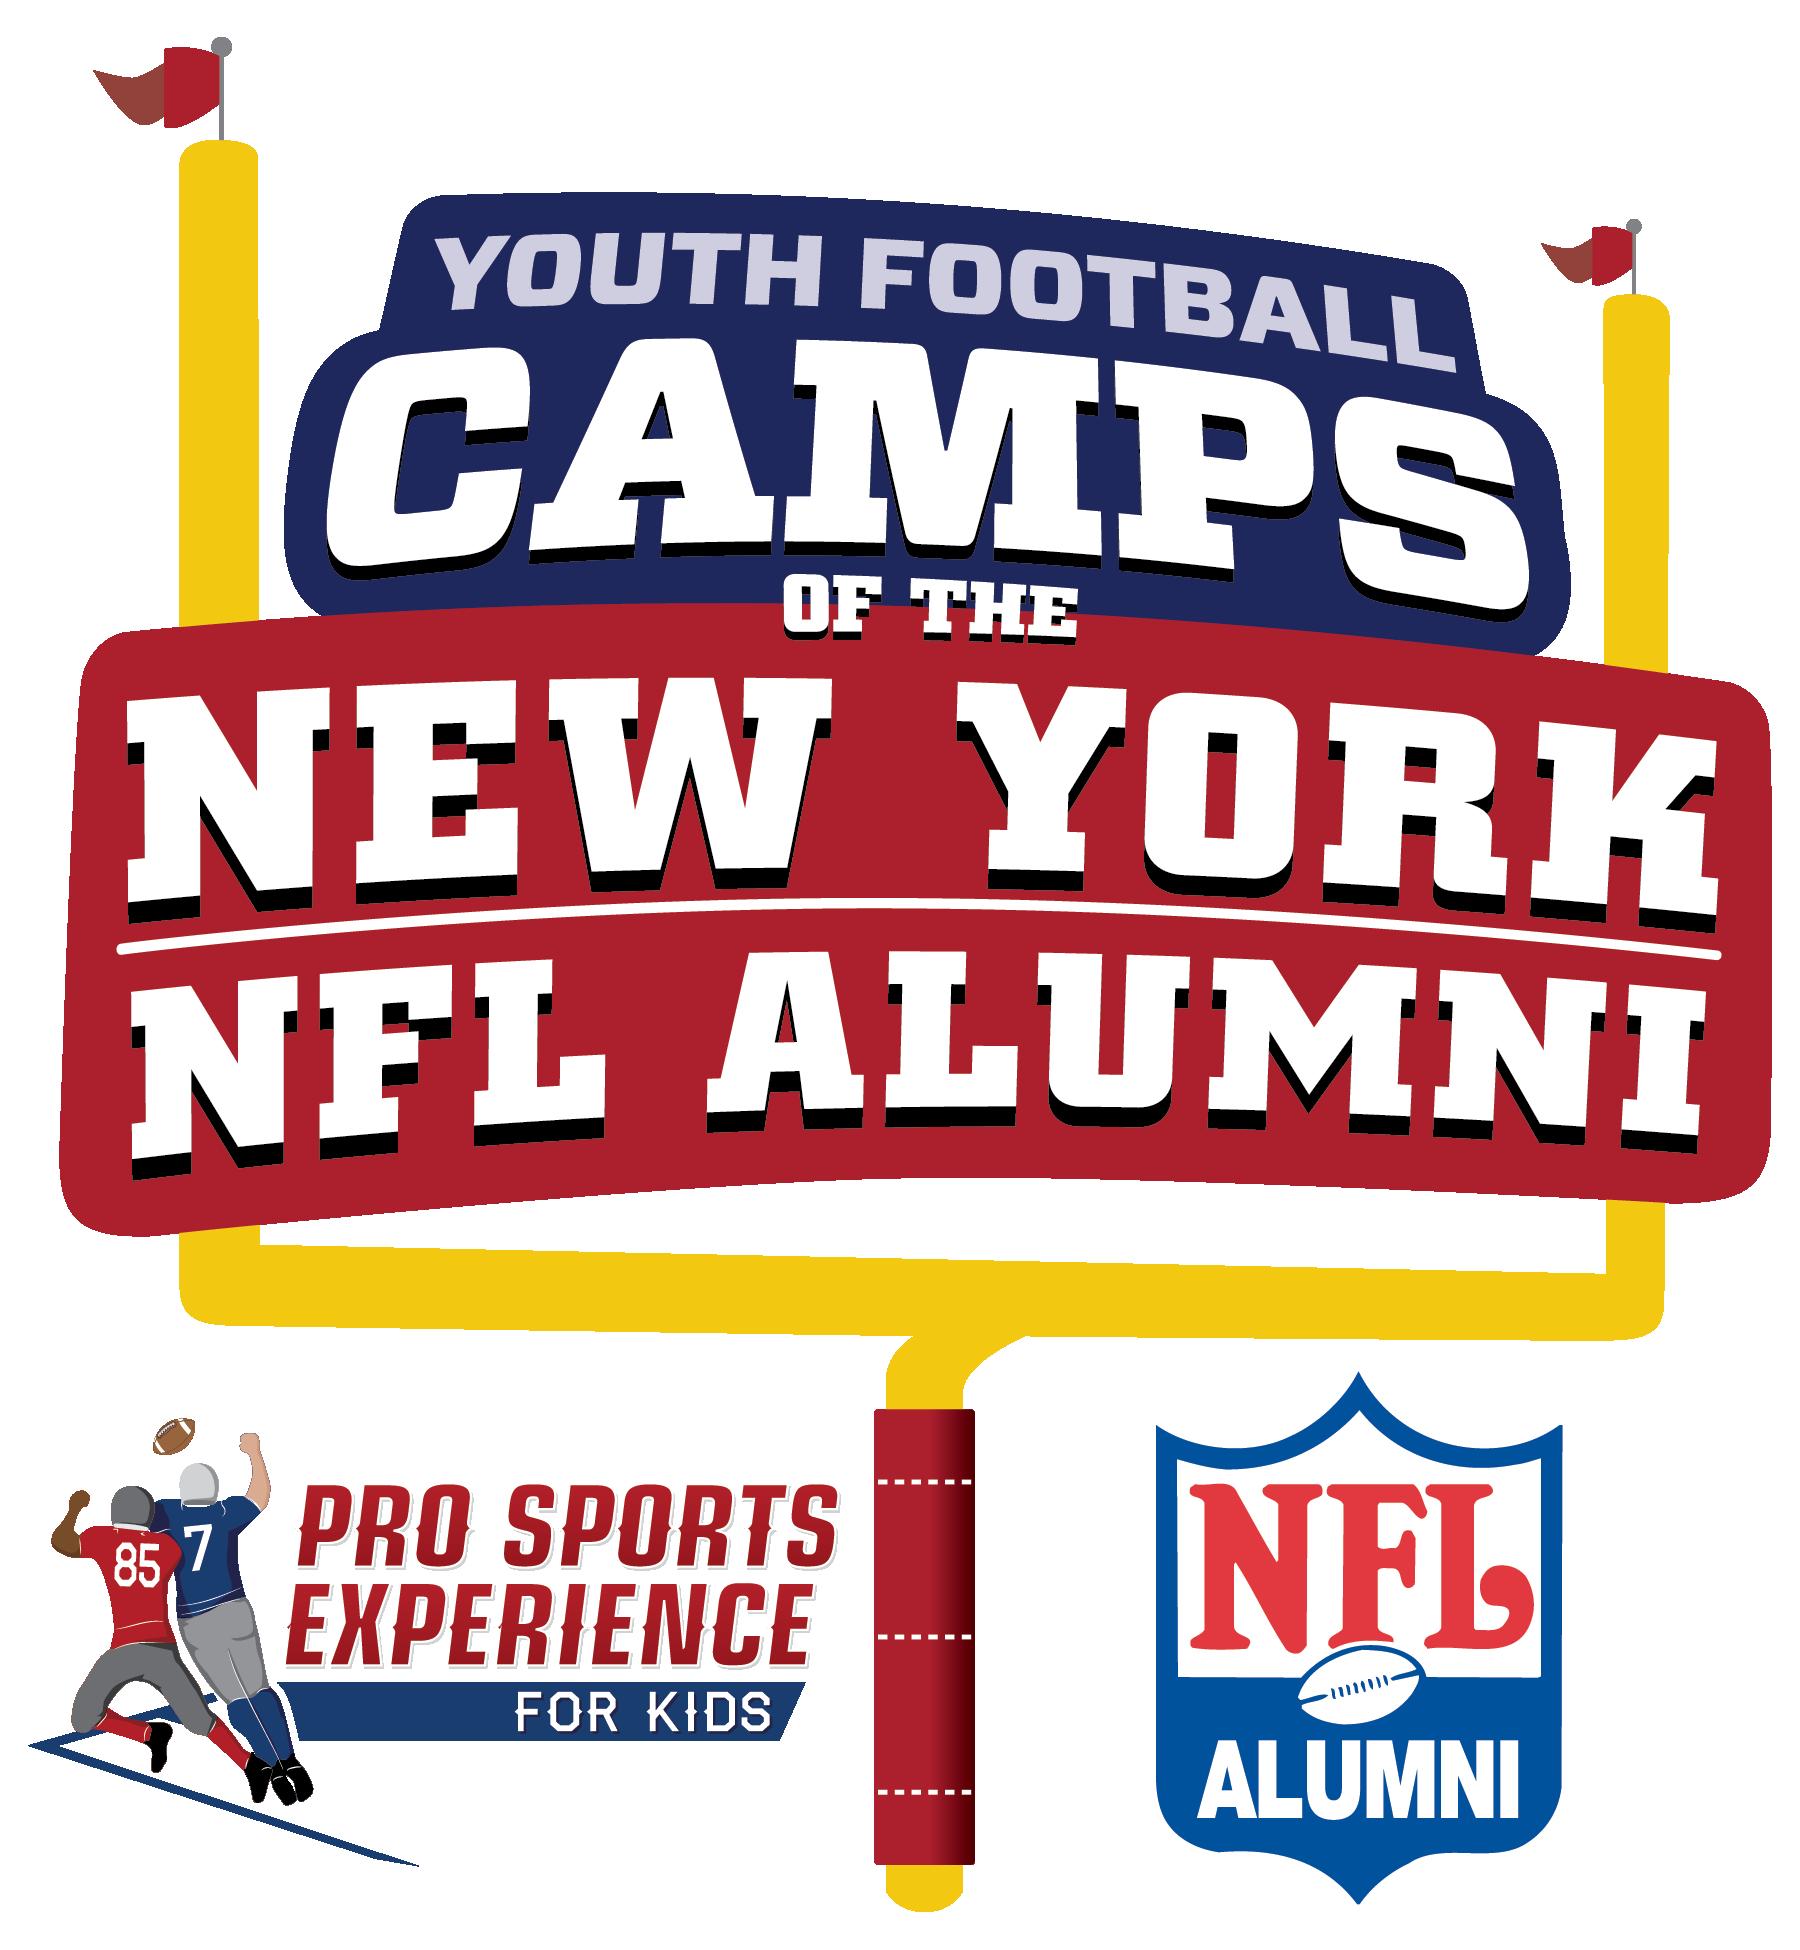 New York NFL Alumni Hero Youth Football Camps - Florham Park